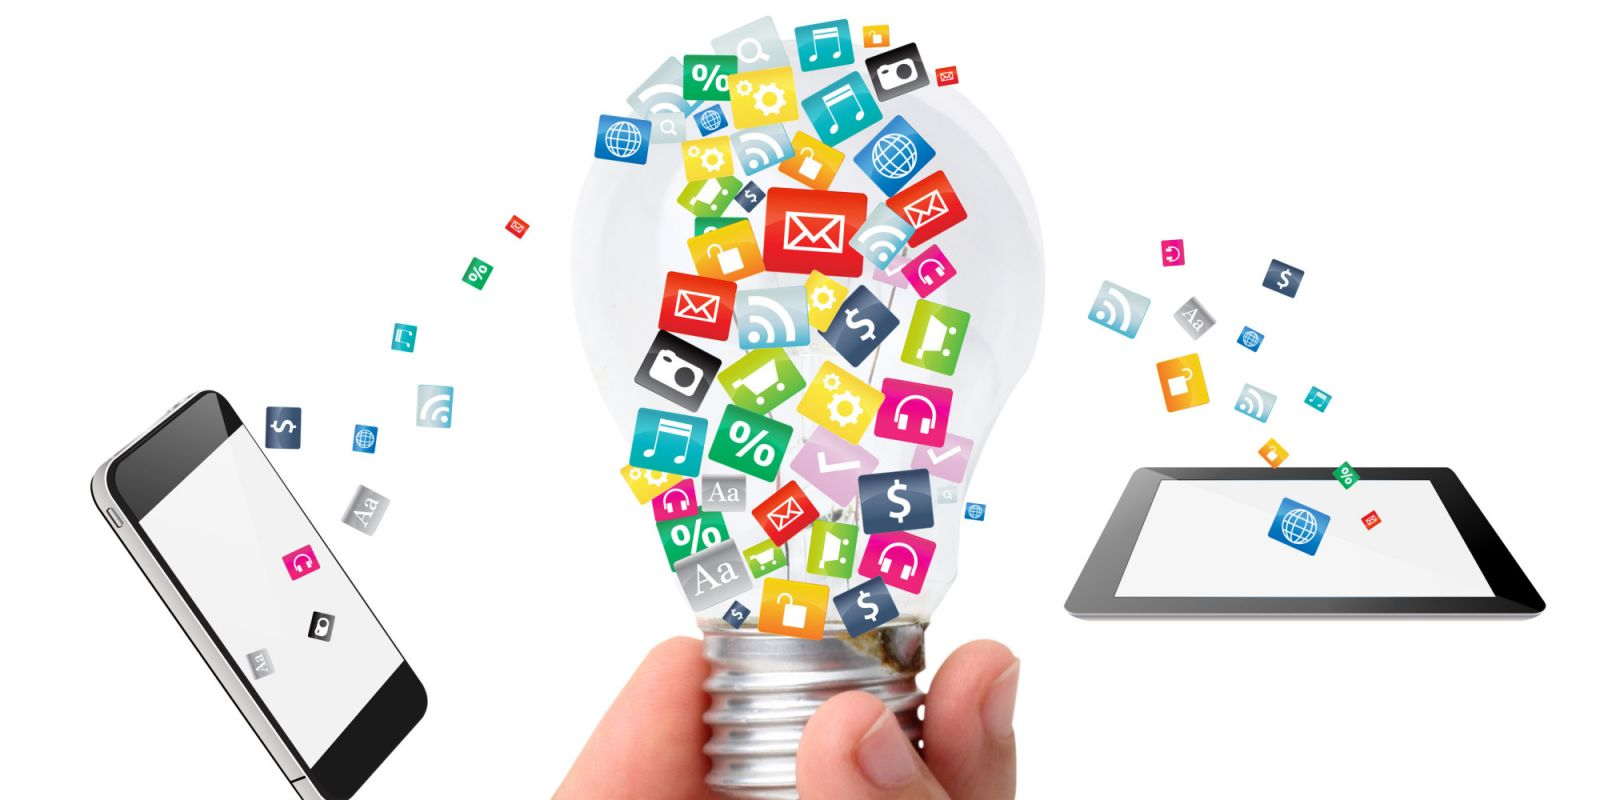 xu-huong-mobile-marketing-nam-2016-tai-viet-nam-hinh-2